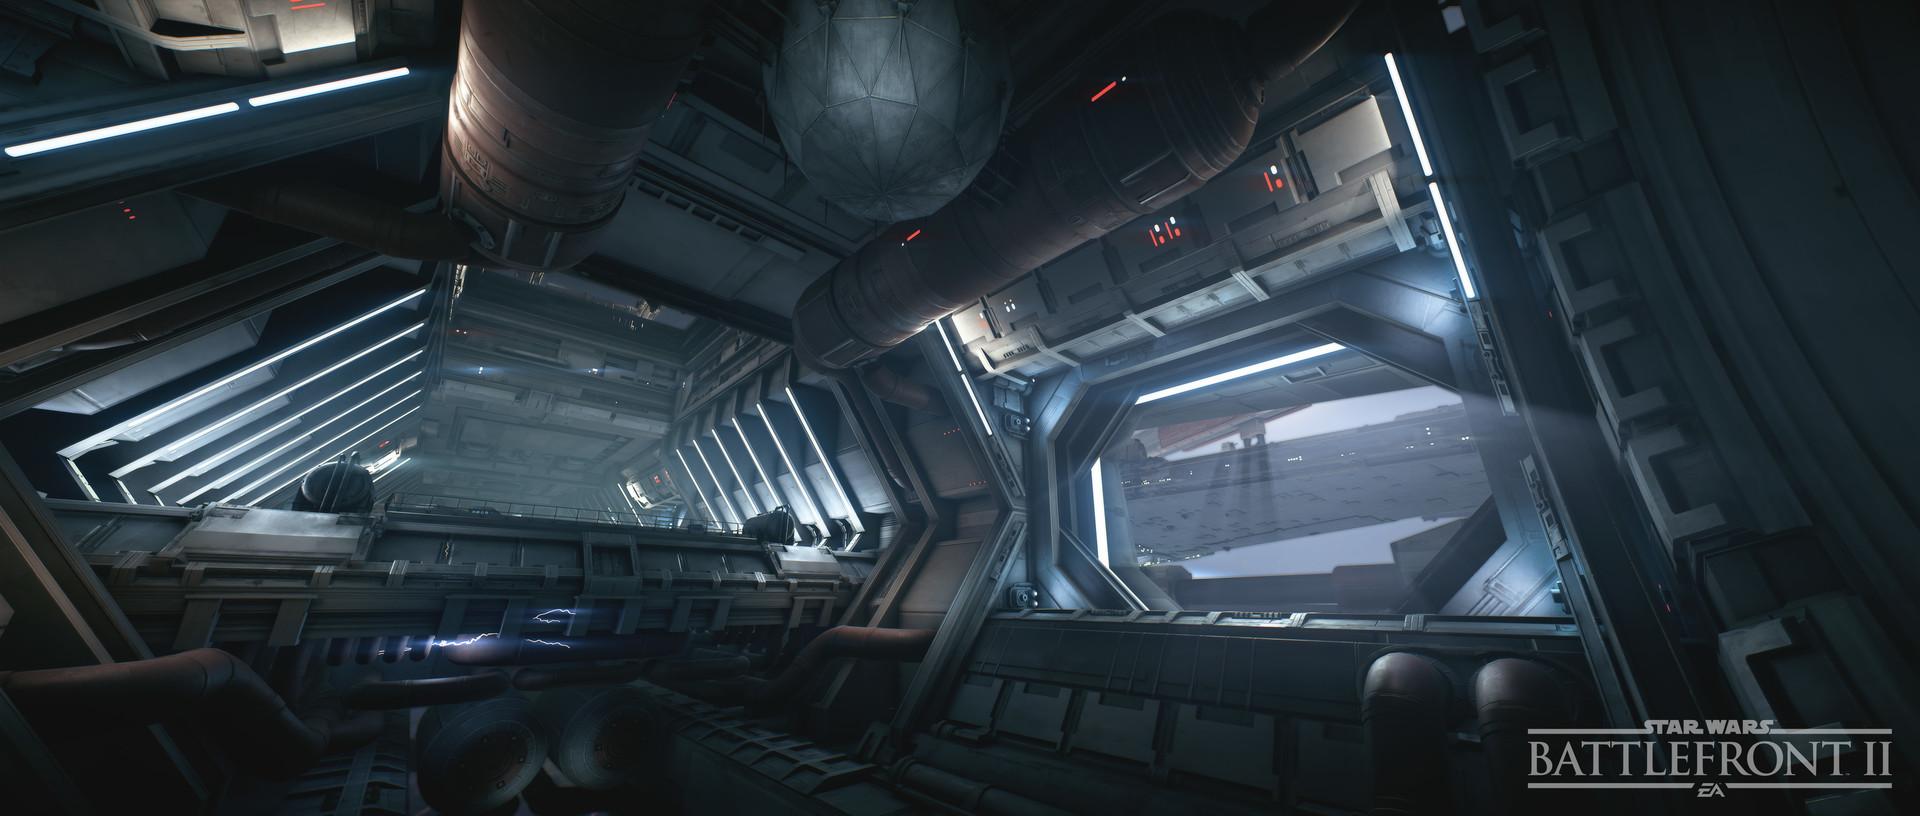 Darius kalinauskas fondor dock starwars conceptart battlefront 11